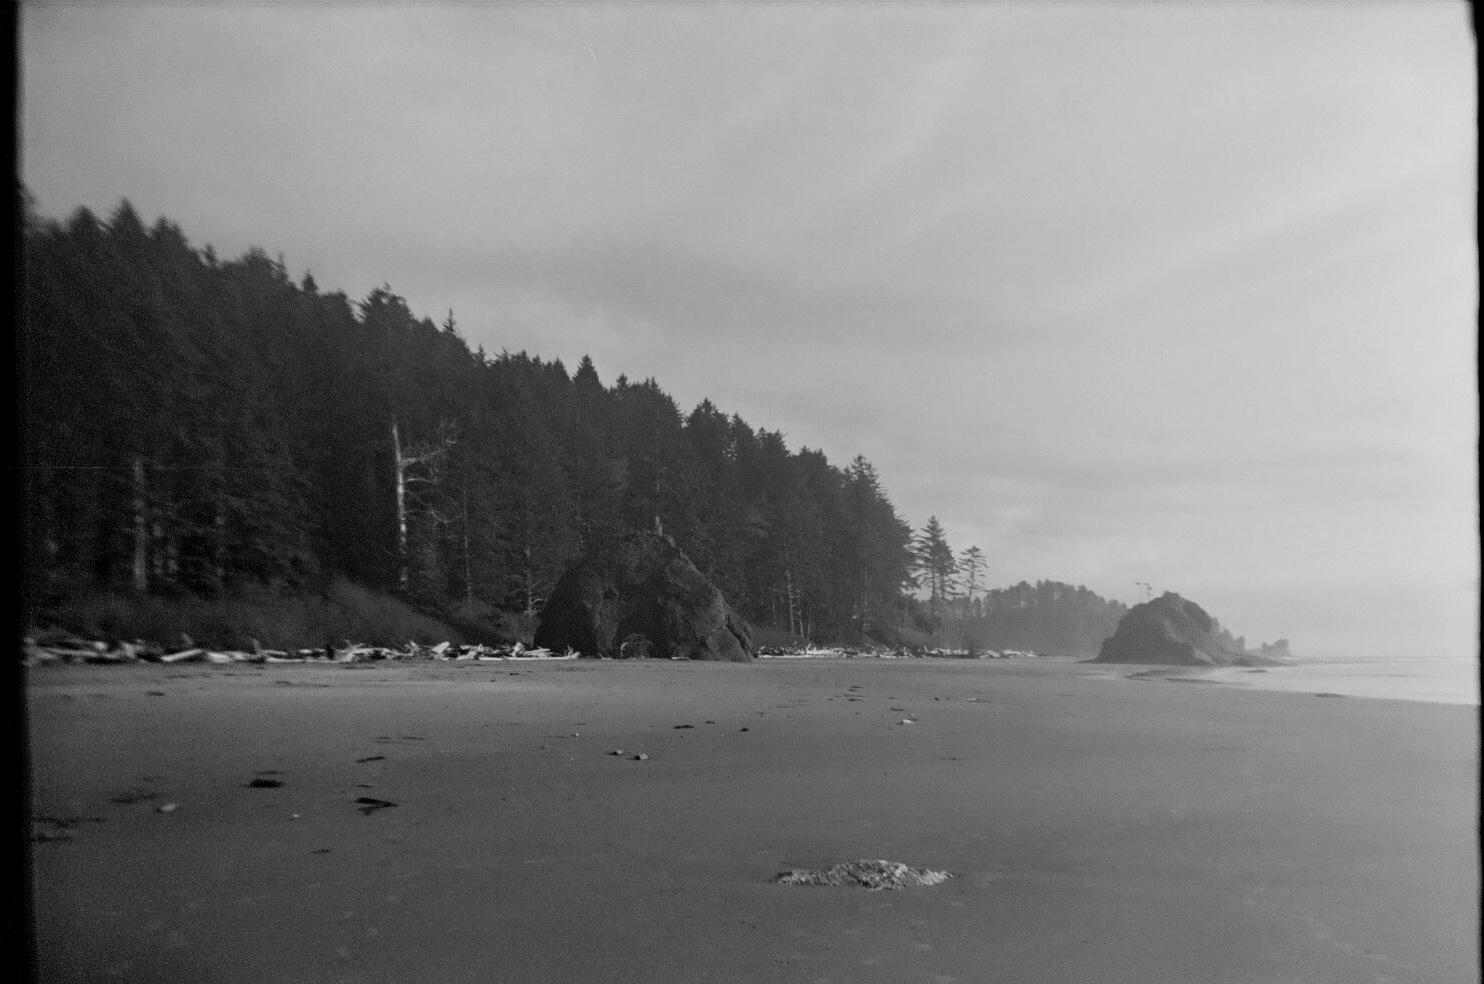 Second Beach, La Push, WA